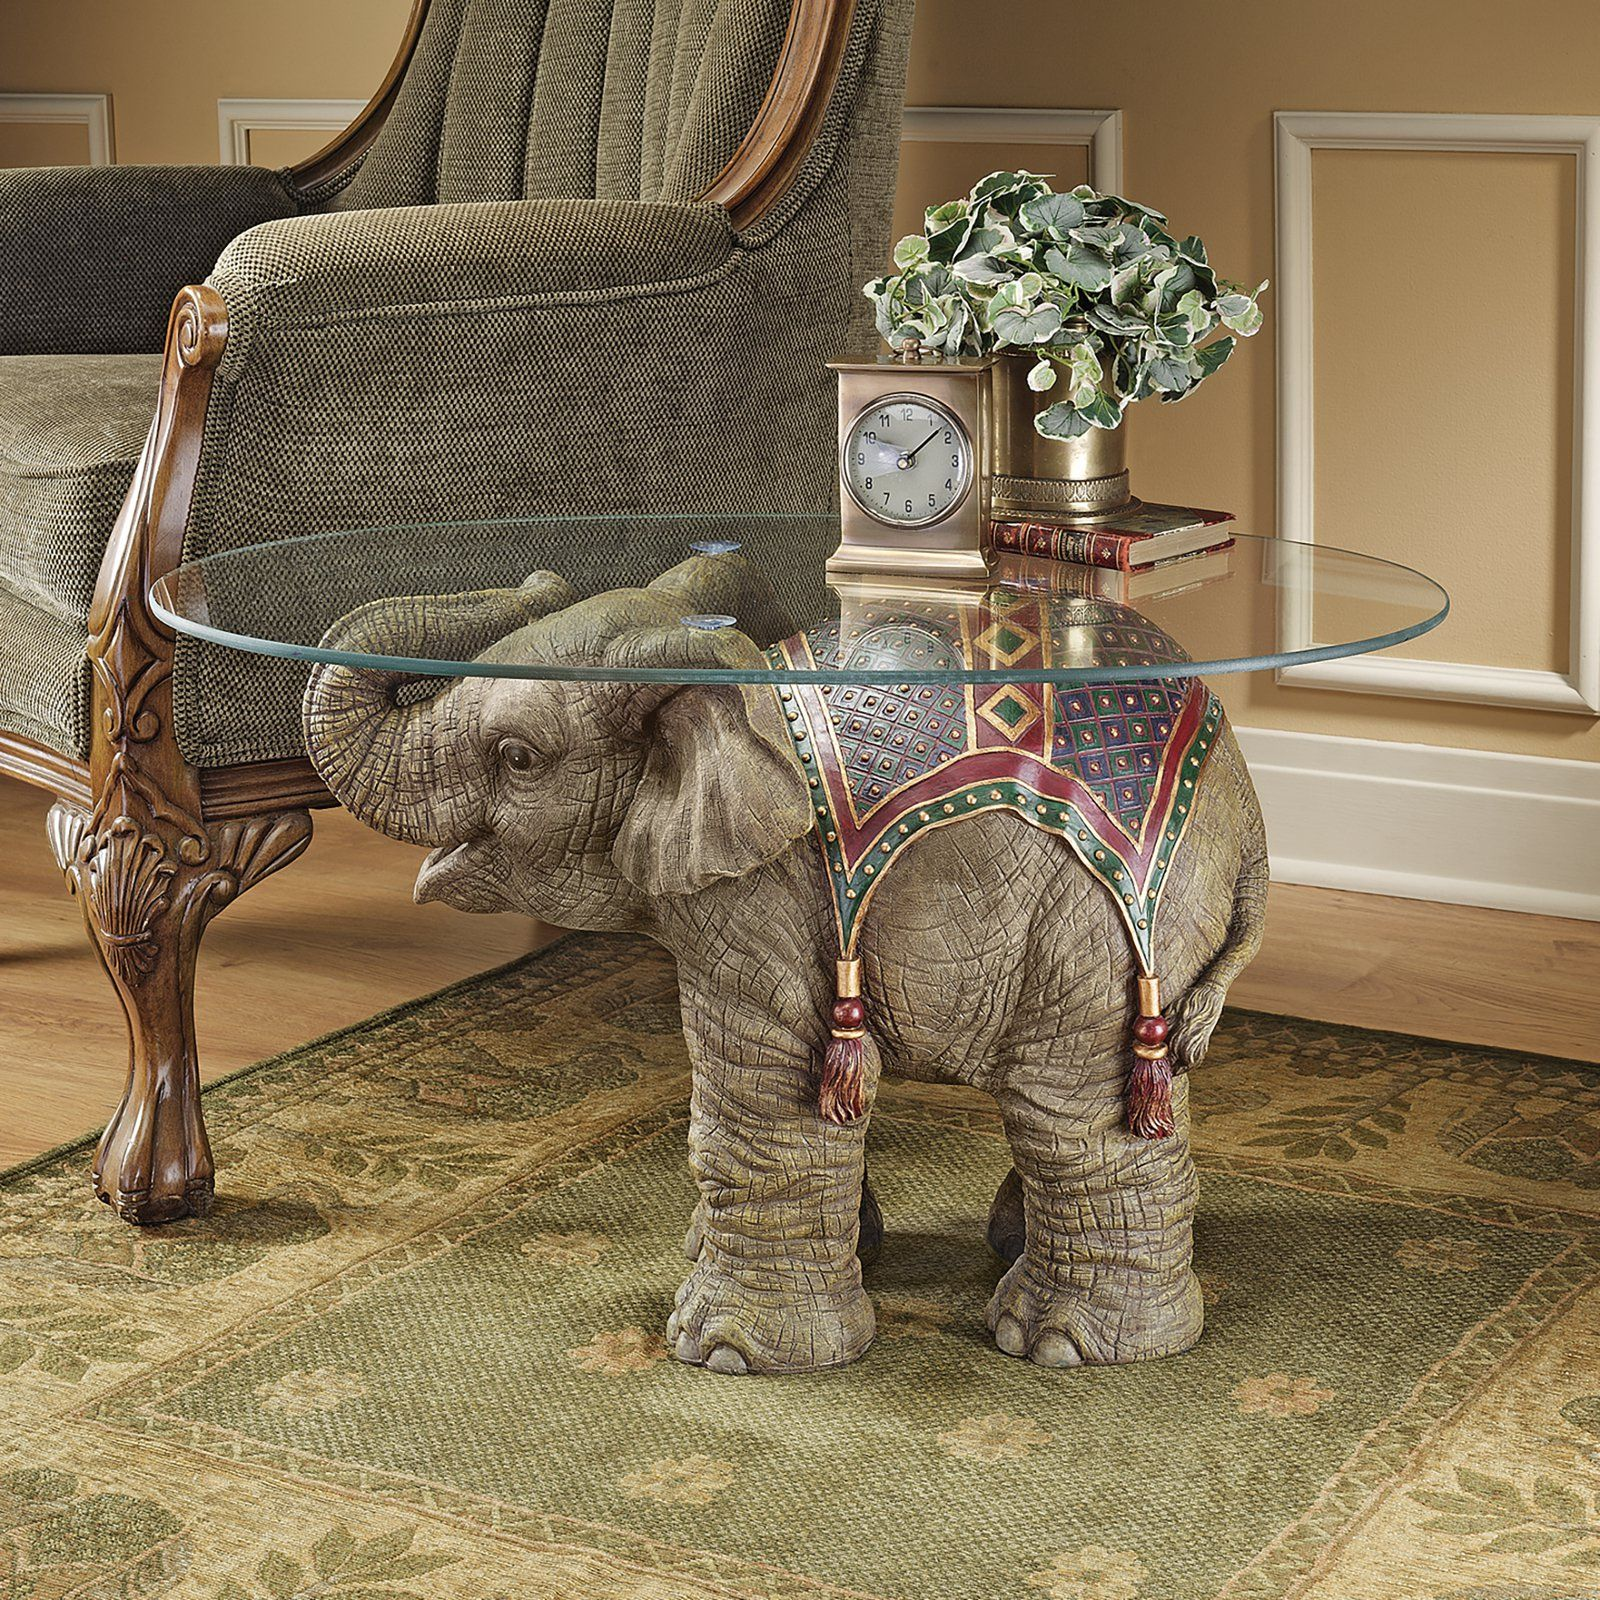 Design Toscano Jaipur Elephant Festival Glass Topped Cocktail Table Walmart Com In 2021 Elephant Home Decor Coffee Table Design Design Toscano [ 1600 x 1600 Pixel ]